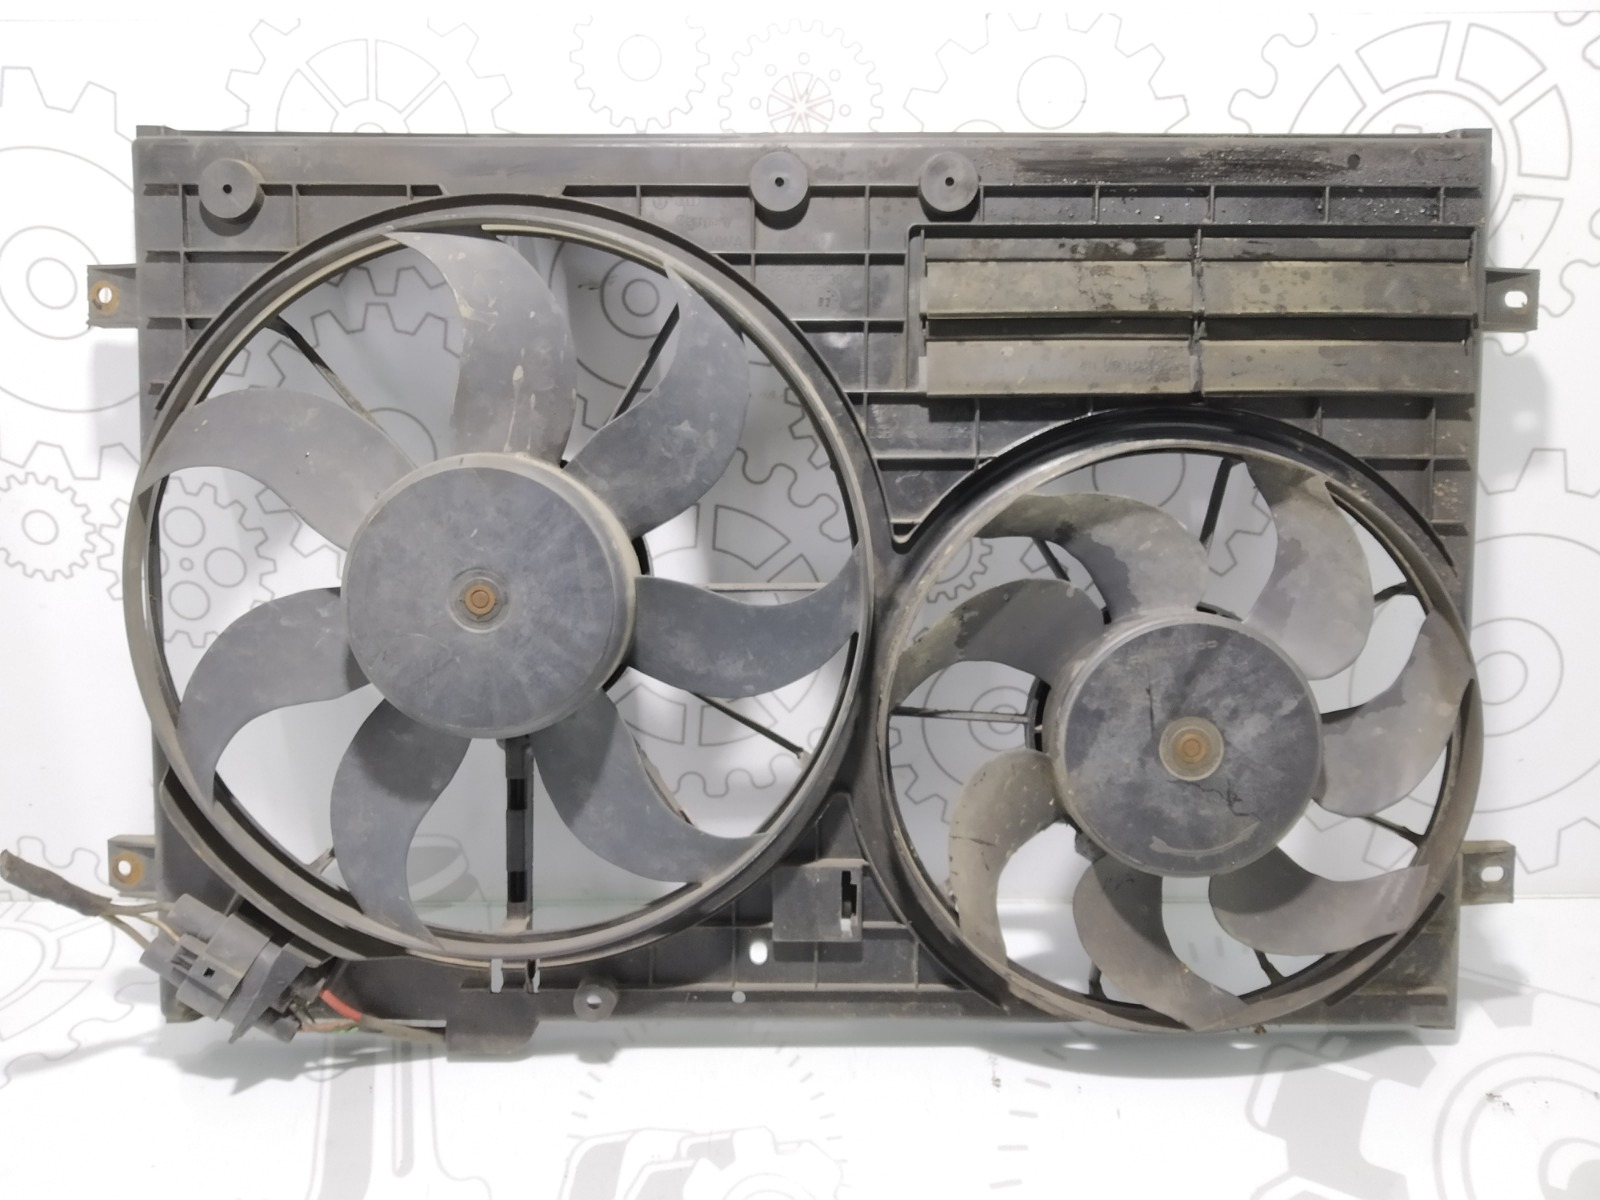 Вентилятор радиатора Volkswagen Passat B6 2.0 TDI 2007 (б/у)